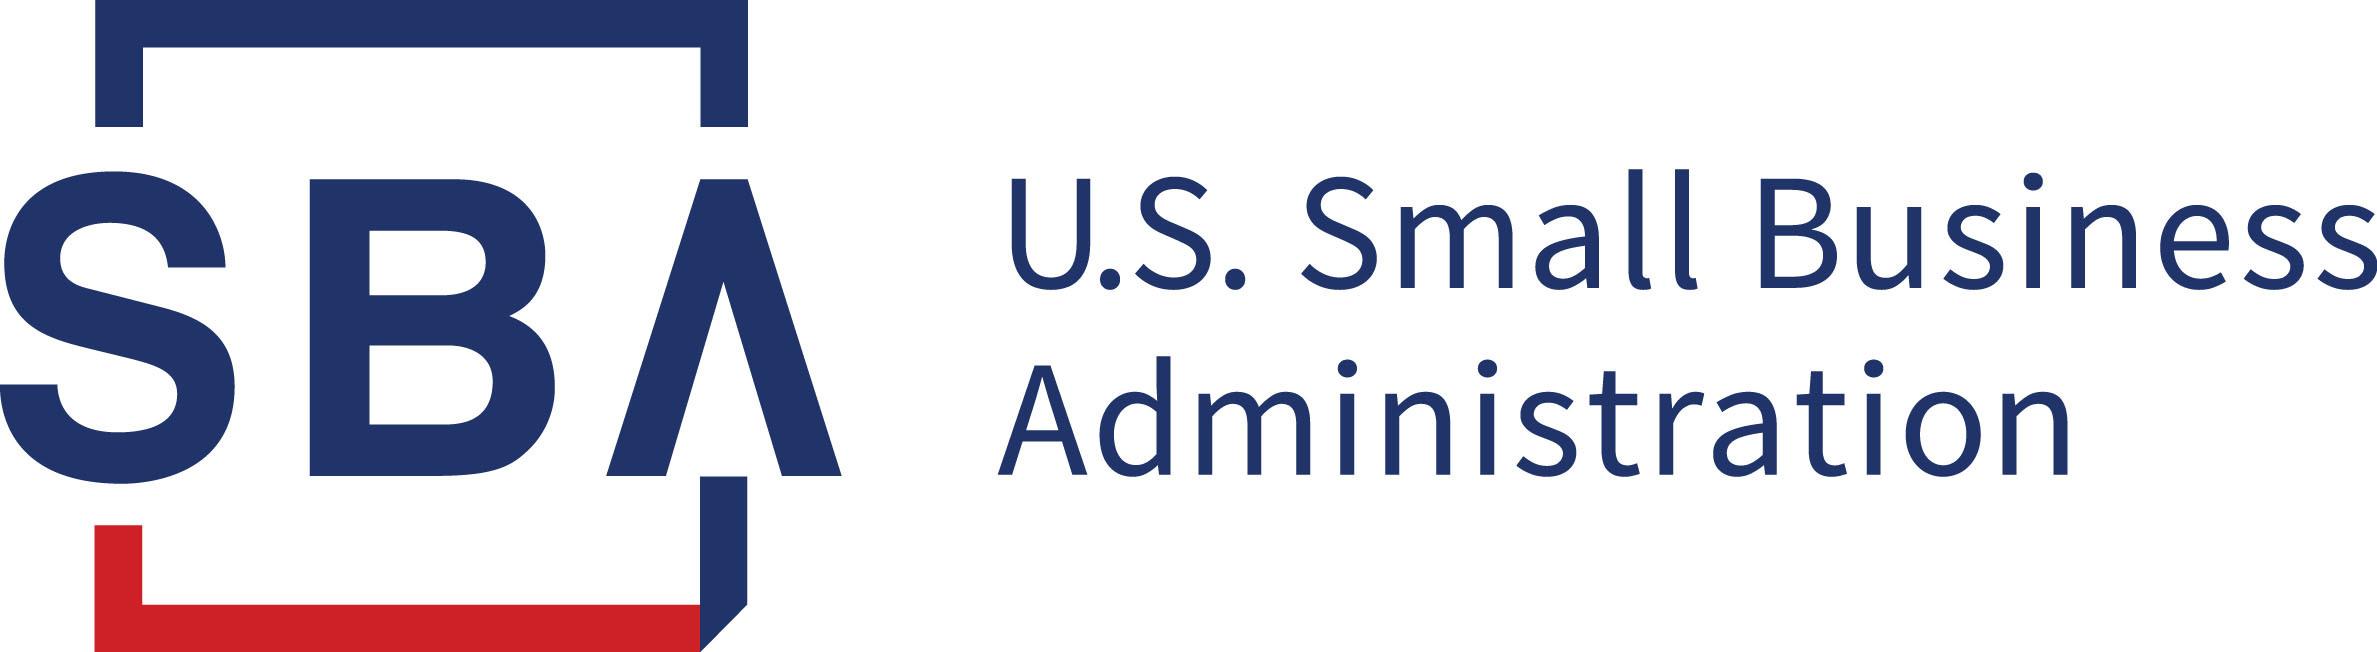 SBA LOGO. (PRNewsFoto/U.S. Small Business Administration) (PRNewsFoto/U.S. SMALL BUSINESS ADMINIS...)